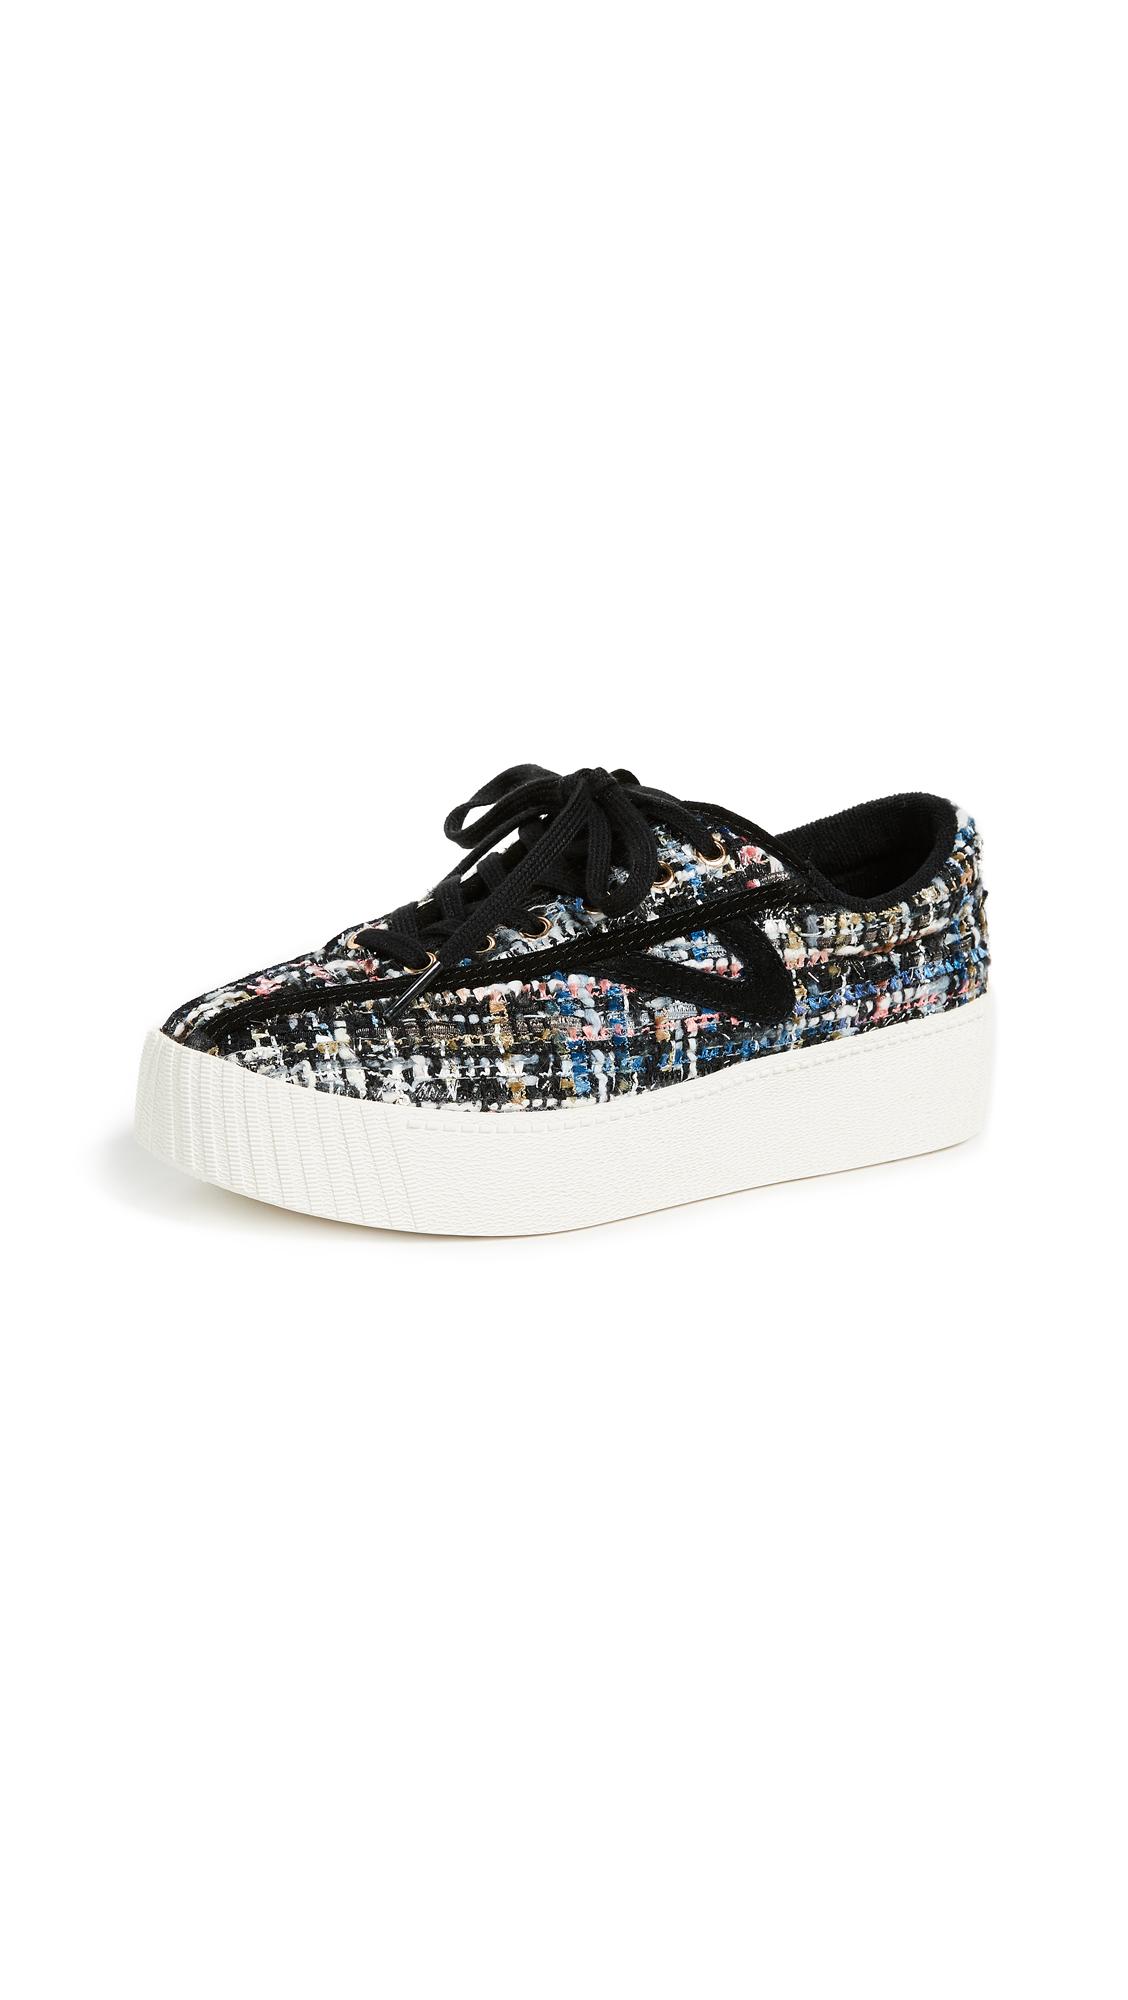 Tretorn Bold Sneakers - Black/Black